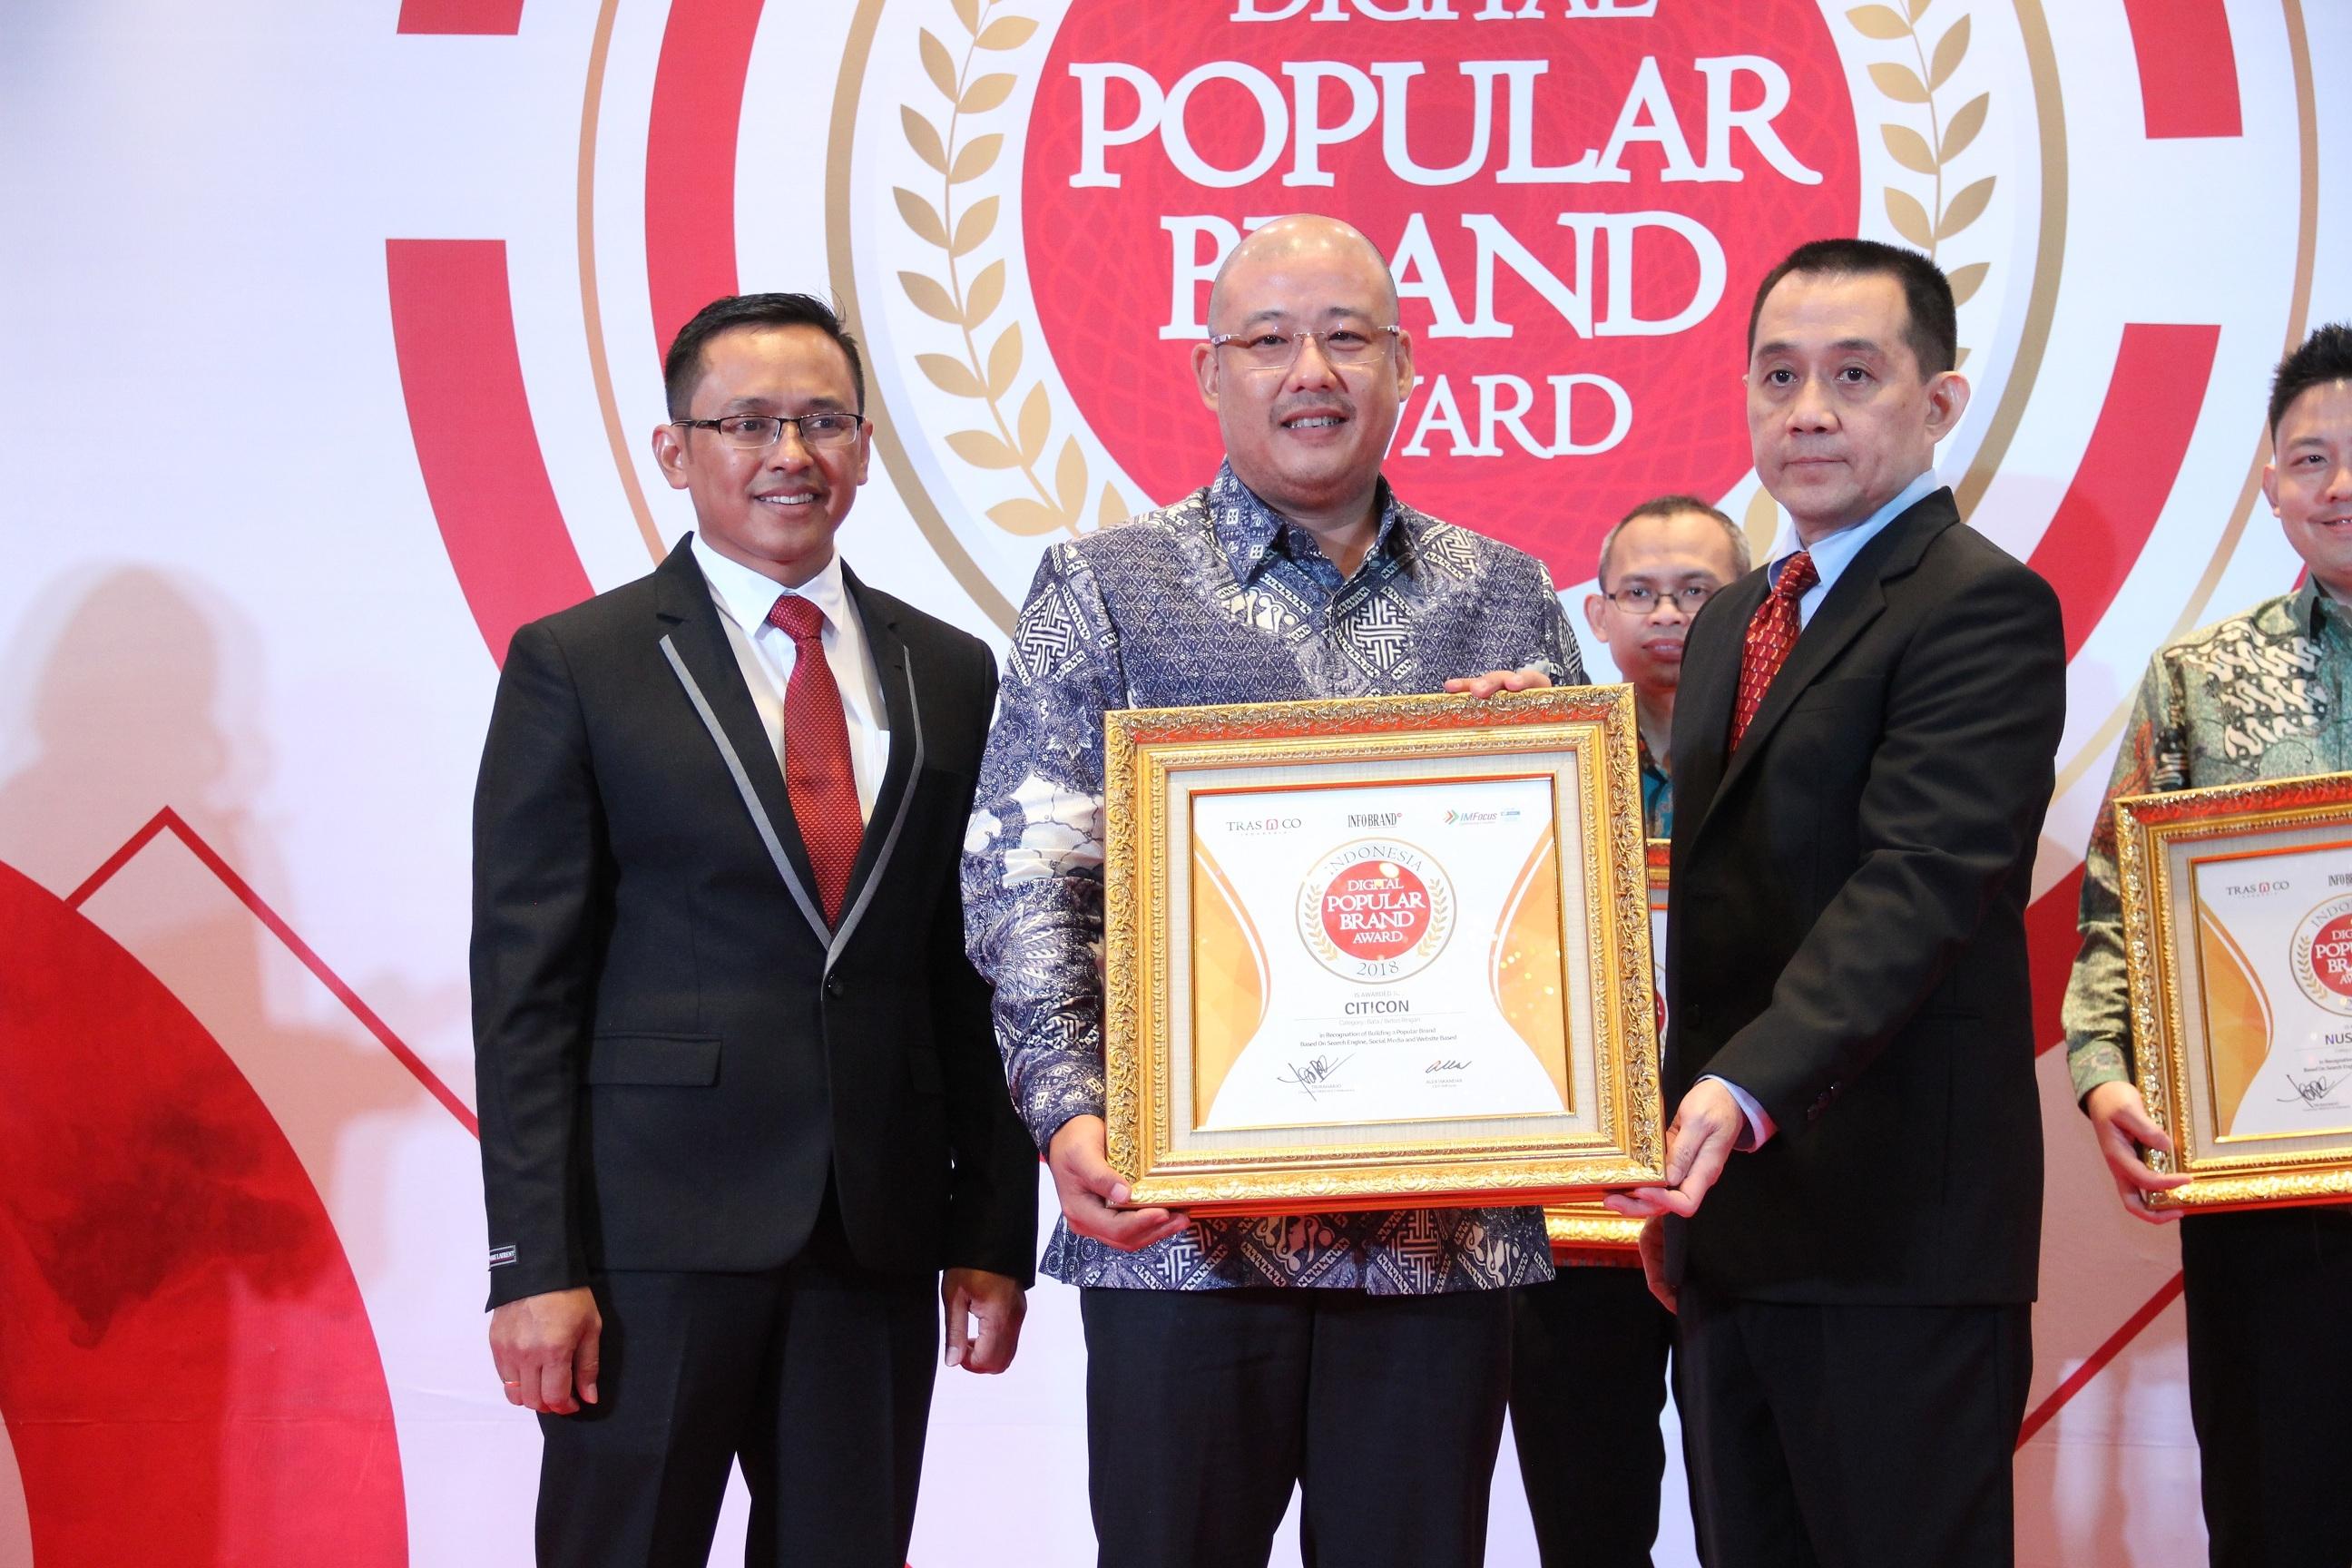 Citicon, Merek Material Bangunan Ramah Lingkungan Sabet Penghargaan Indonesia Digital Popular Brand Award 2018